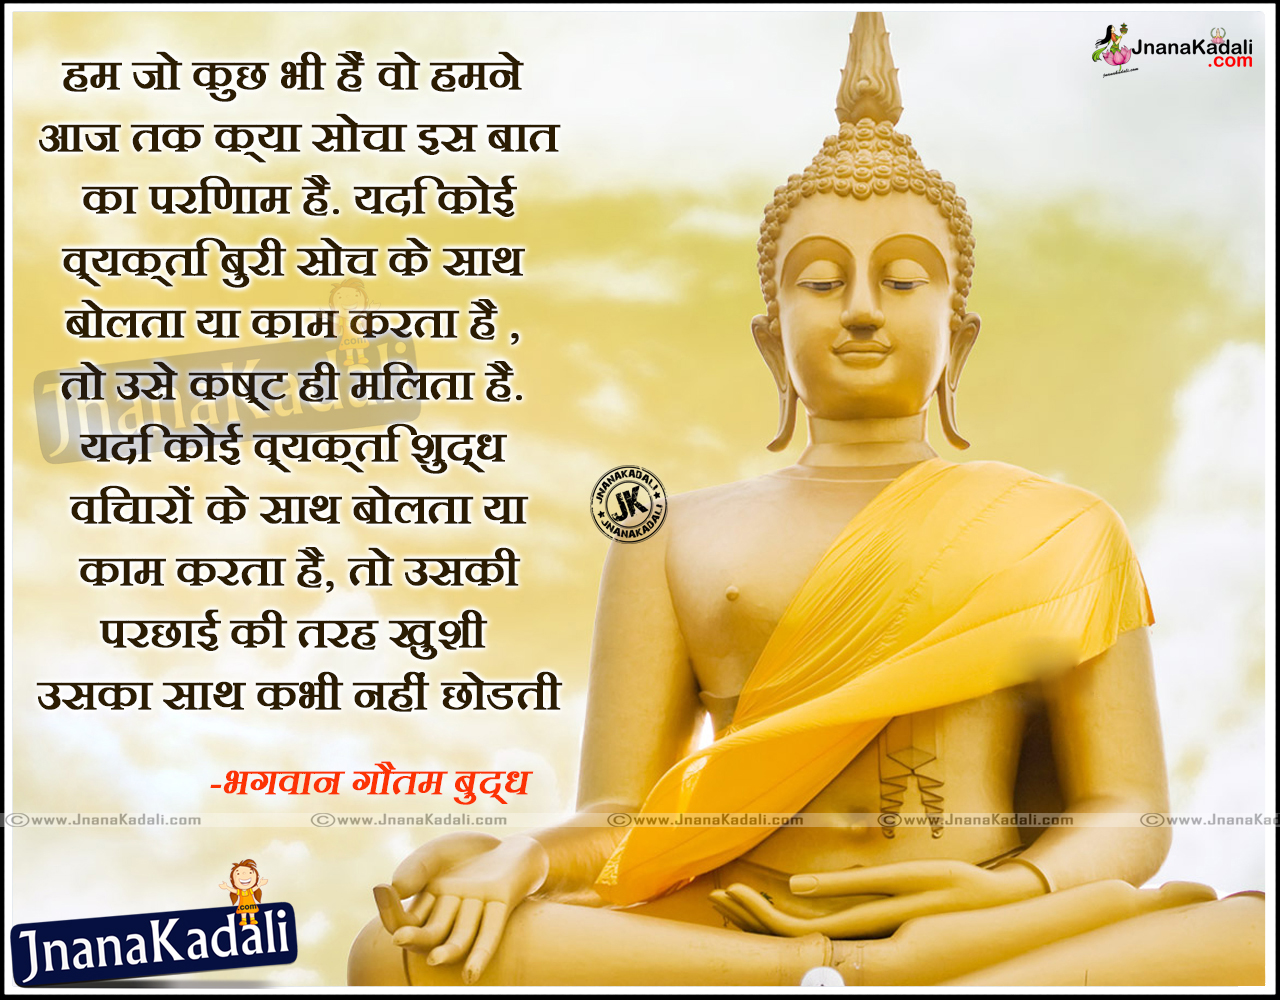 Gautama Buddha Quotes Gautam Buddha Telugu Inspiring Words About Humanity  Jnana Kadali